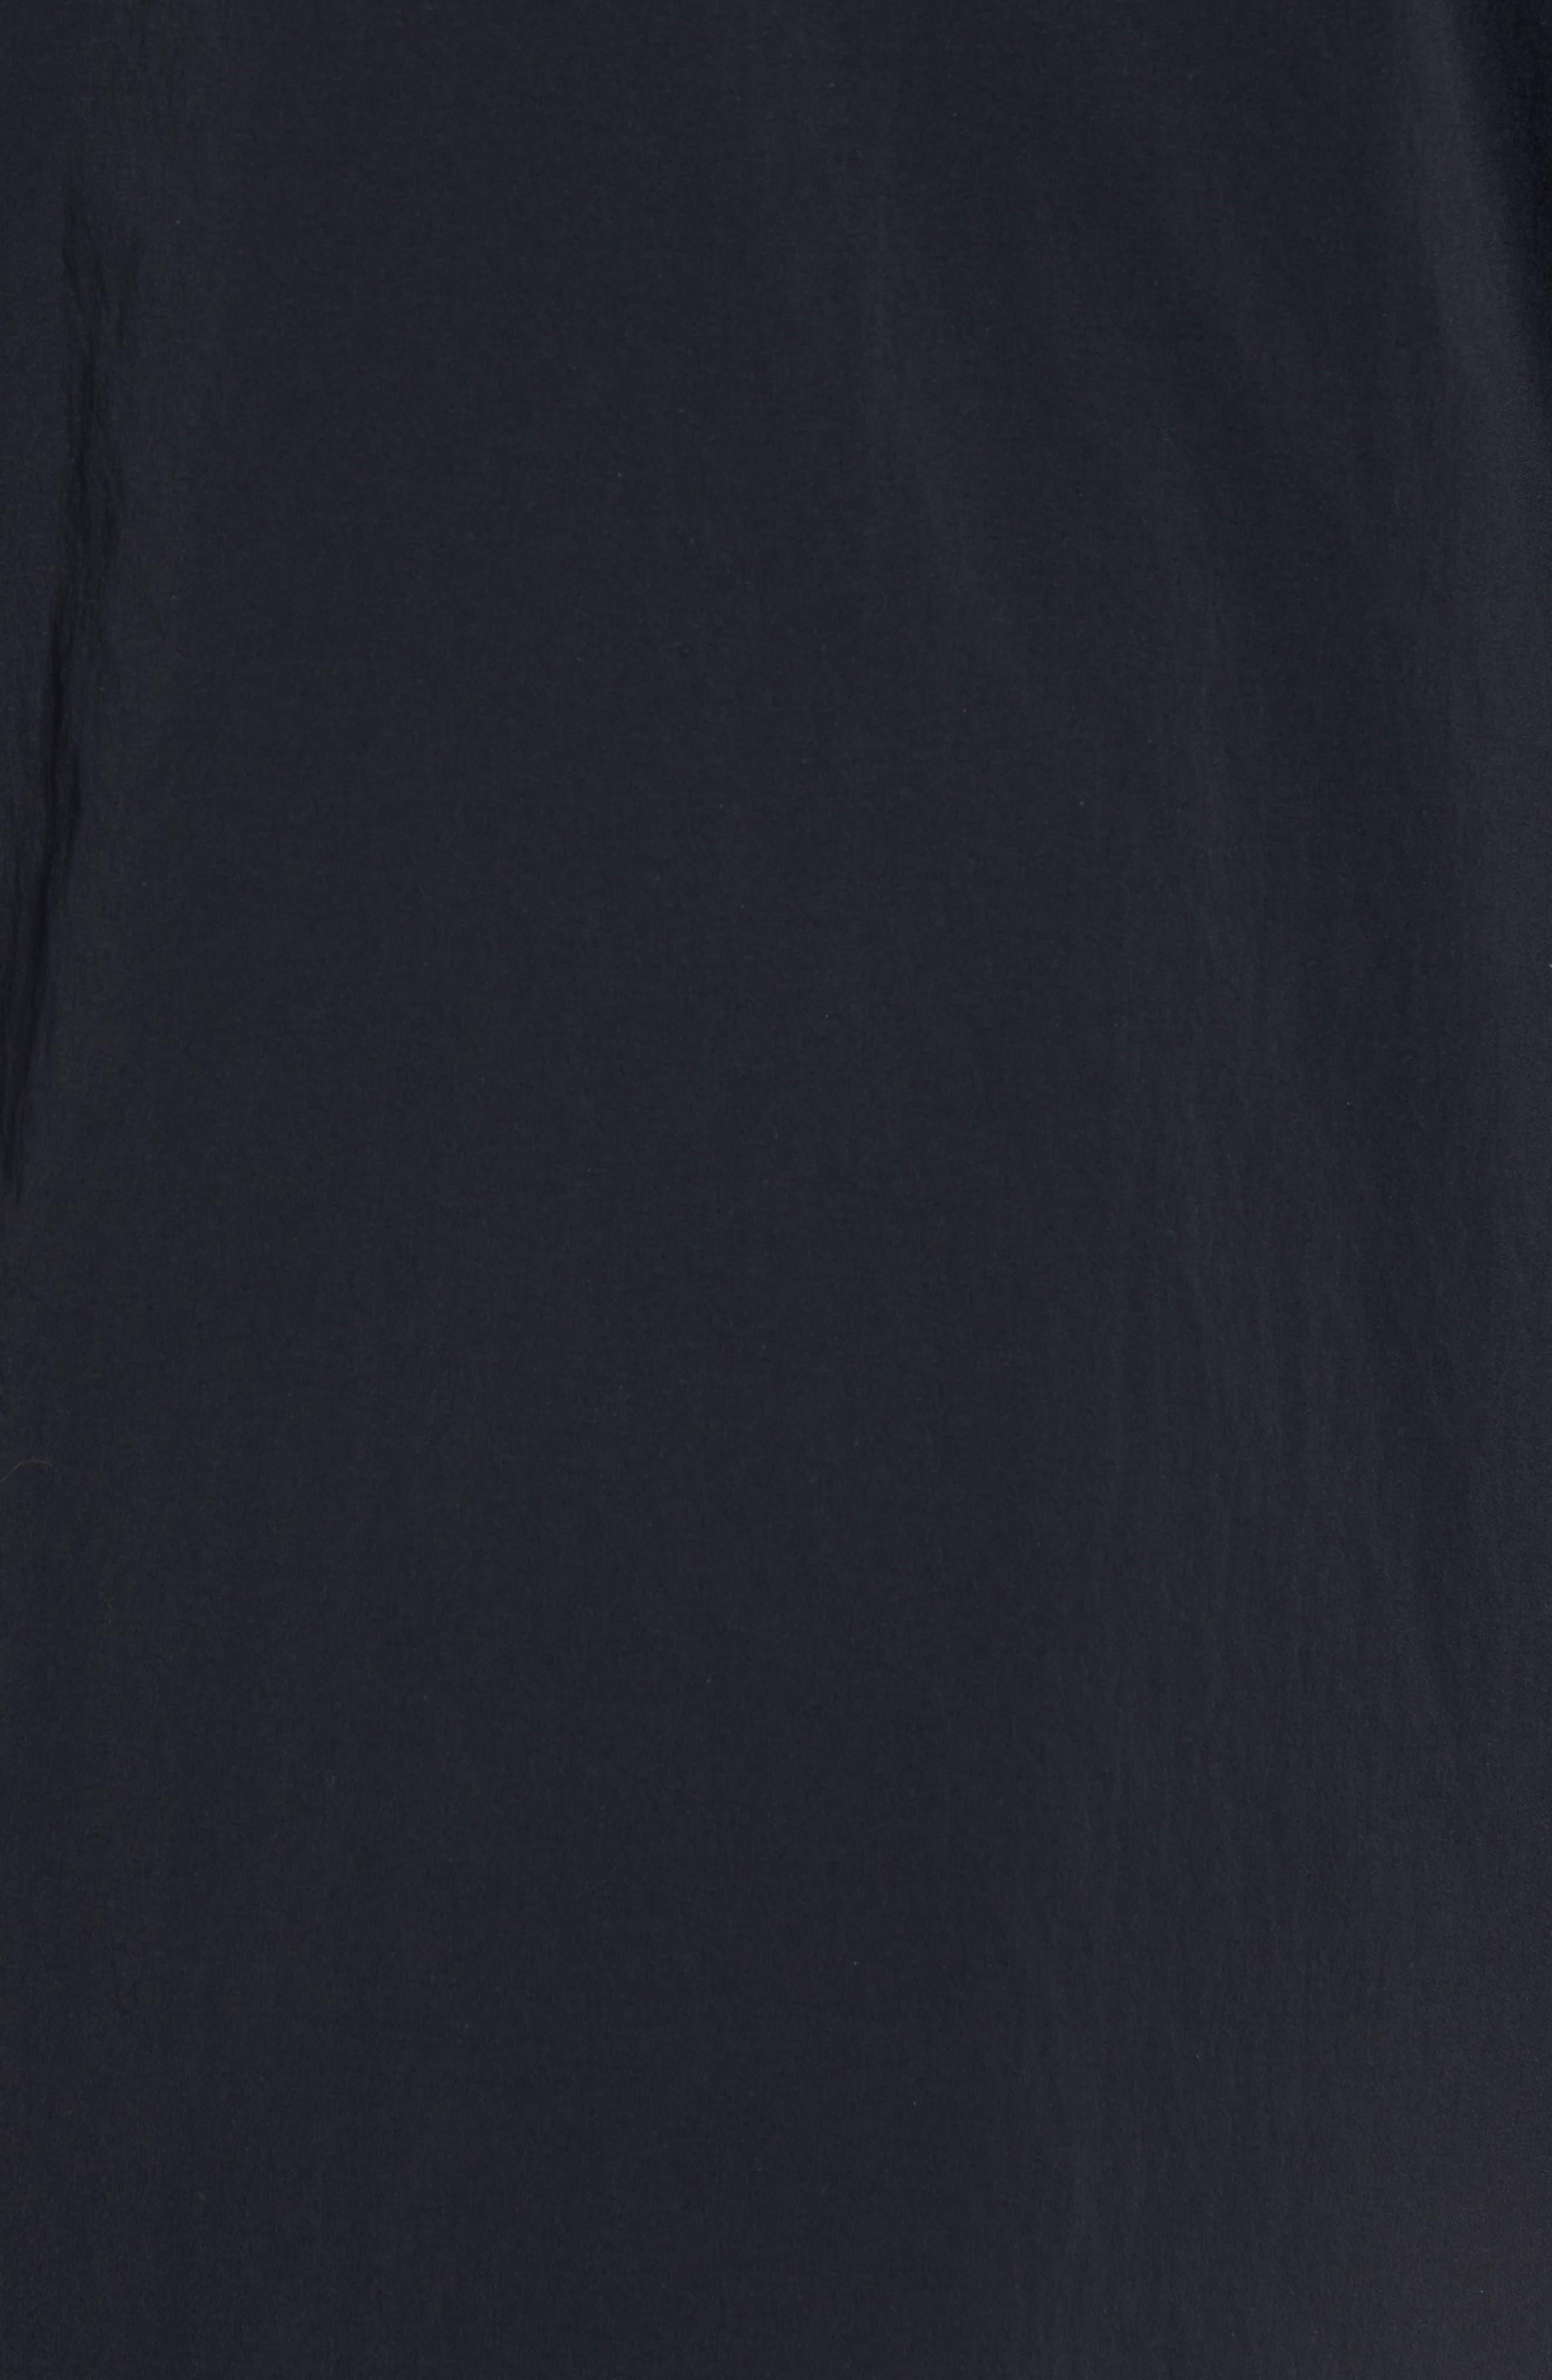 Insulated Trim Sideline Jacket,                             Alternate thumbnail 5, color,                             Black